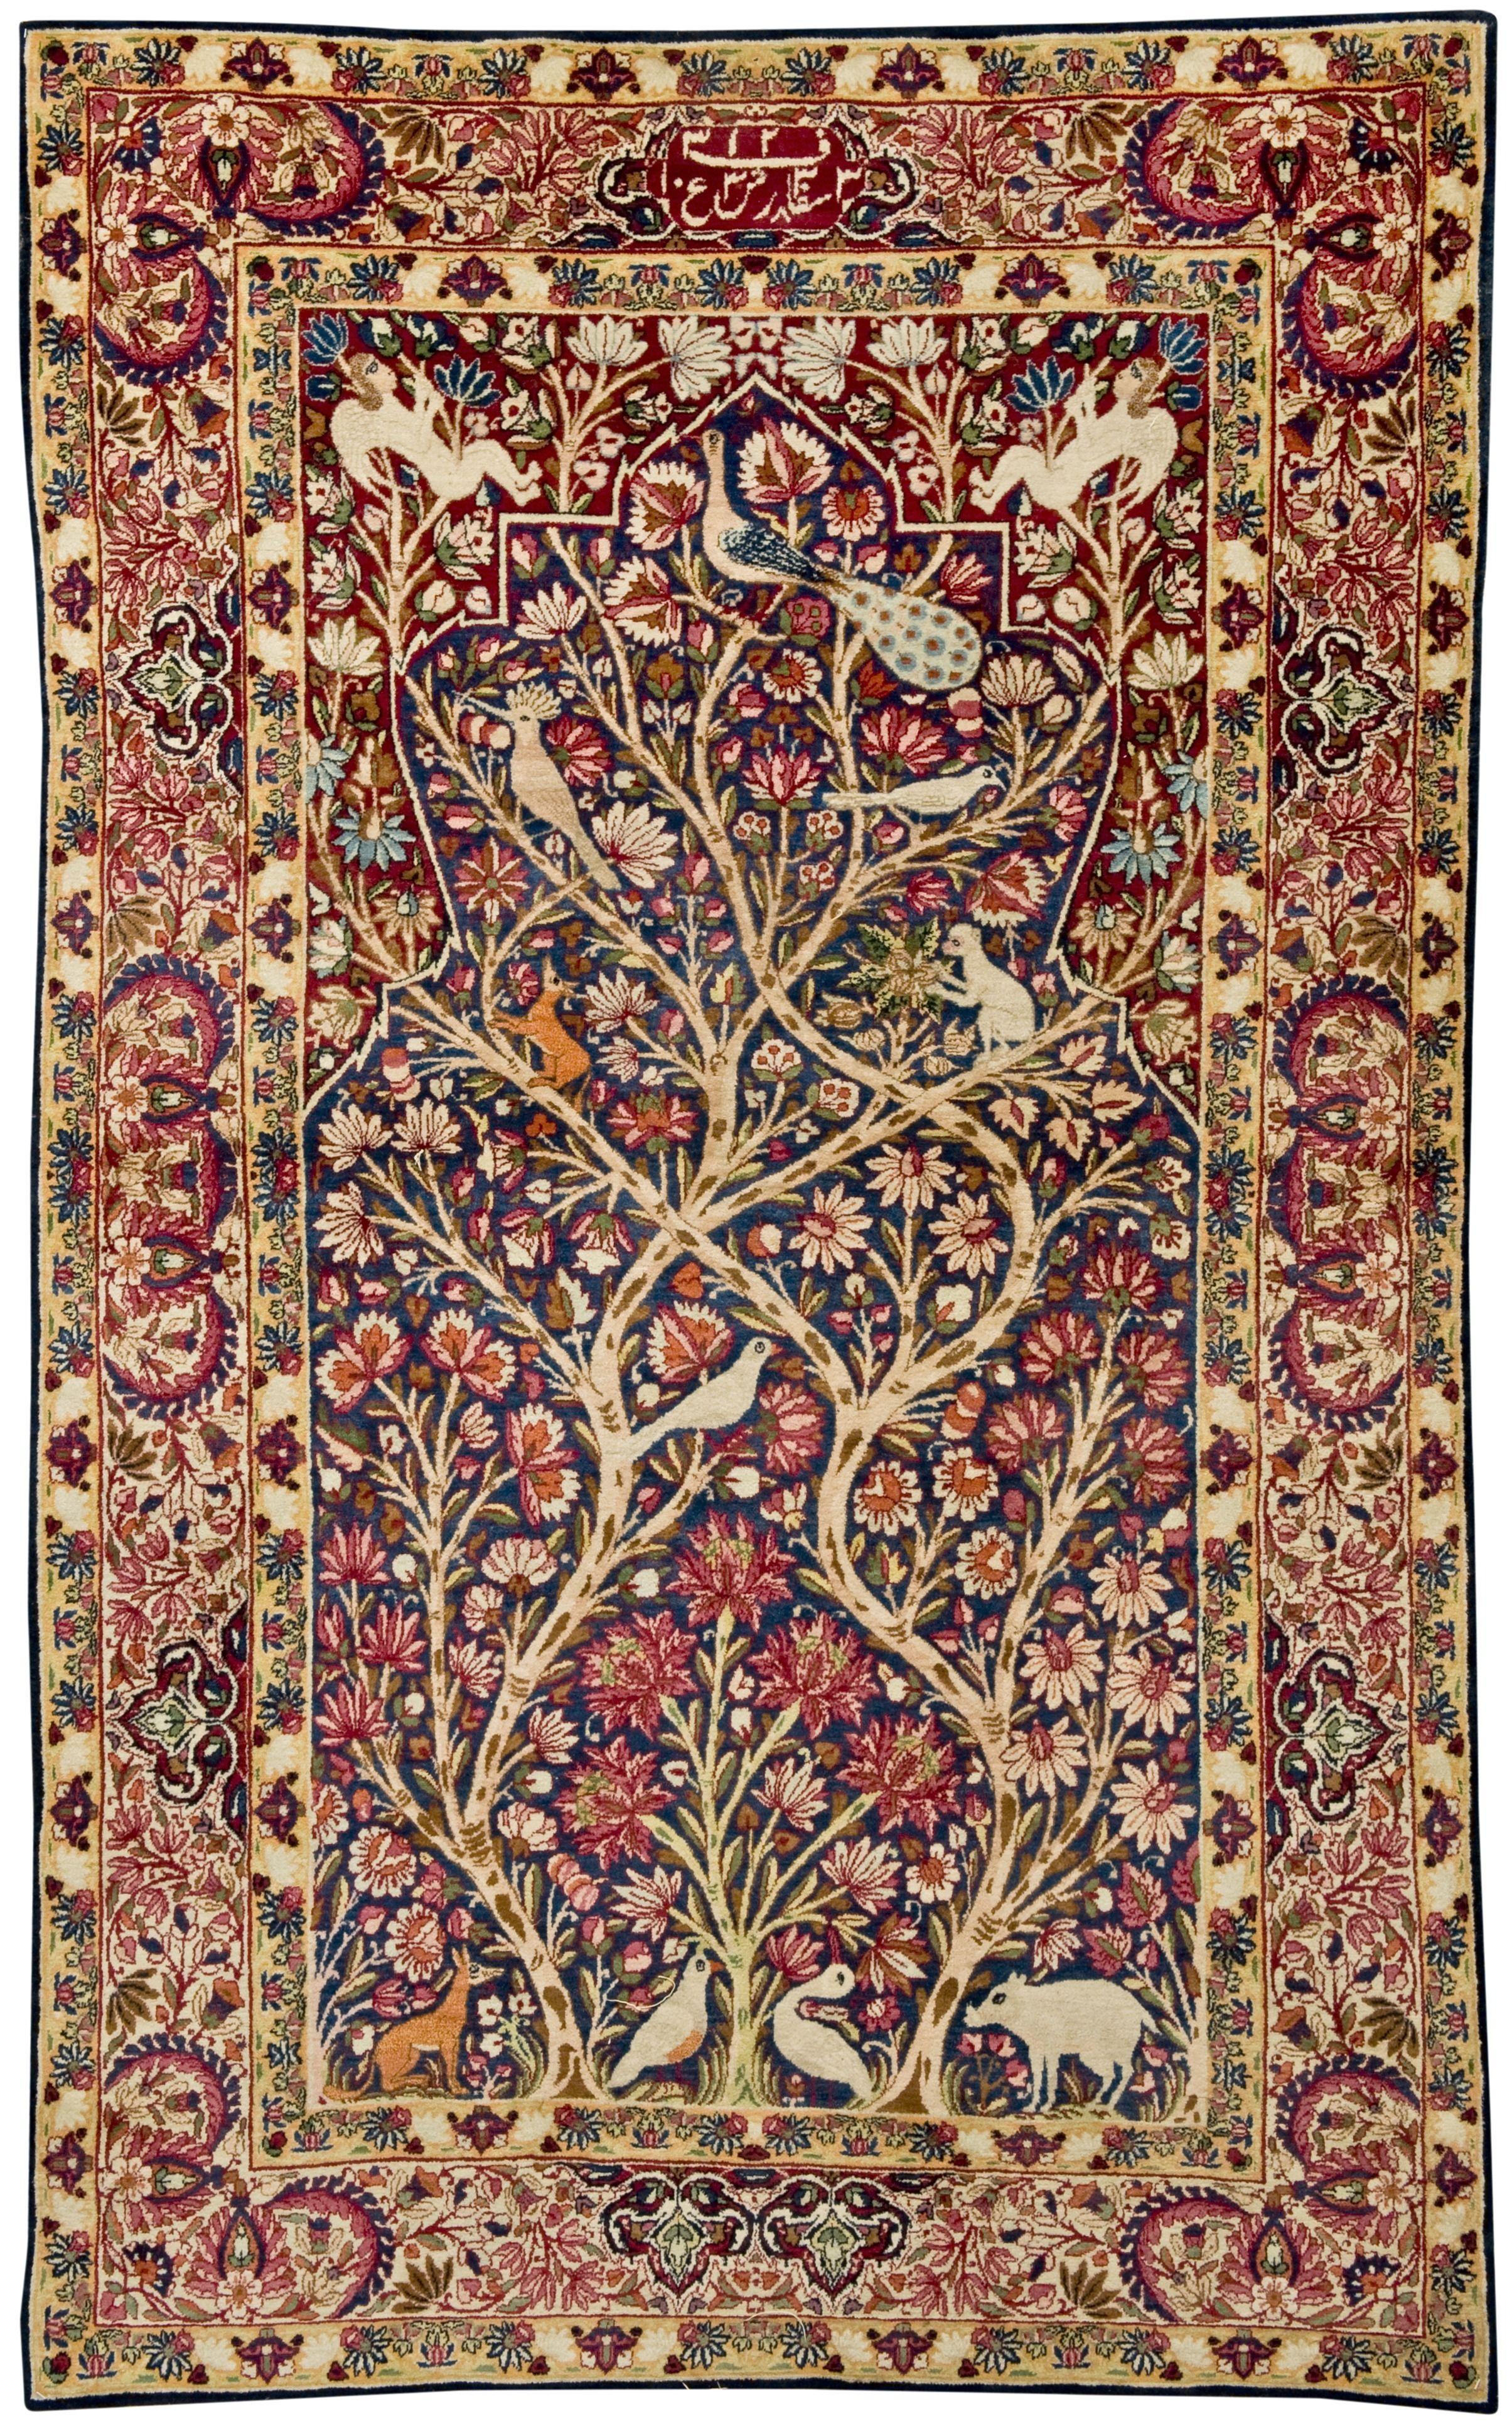 Persian Kerman Laver Rug Rugs Kerman Rugs Rugs On Carpet